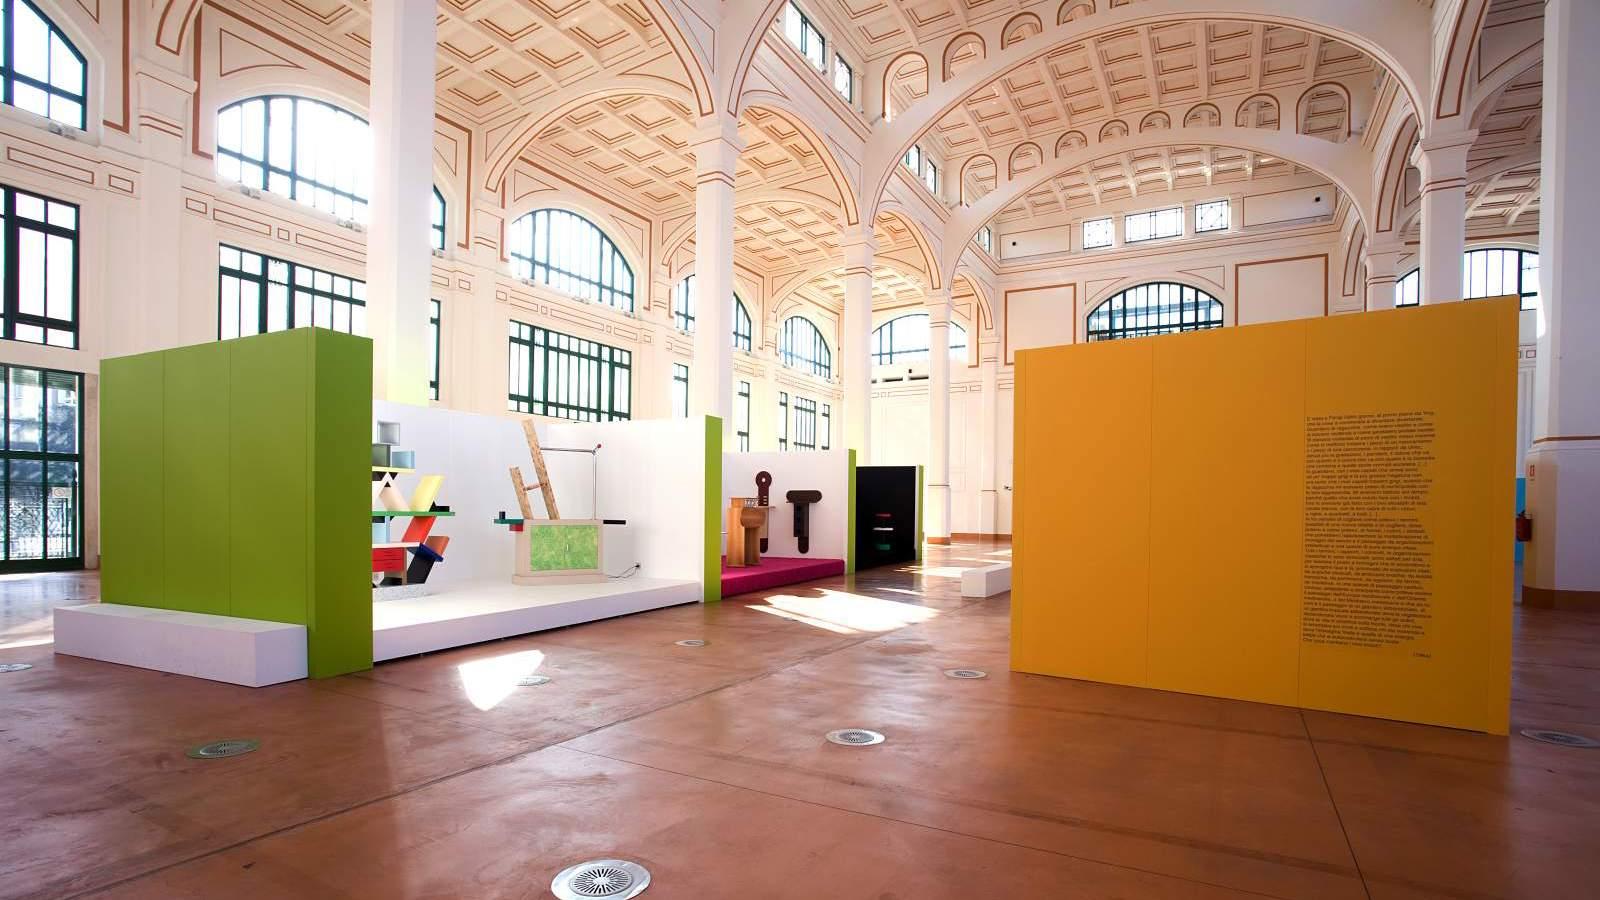 Bottega - Aleestimento Mostra su Ettore Sottsass: 2008 Trieste